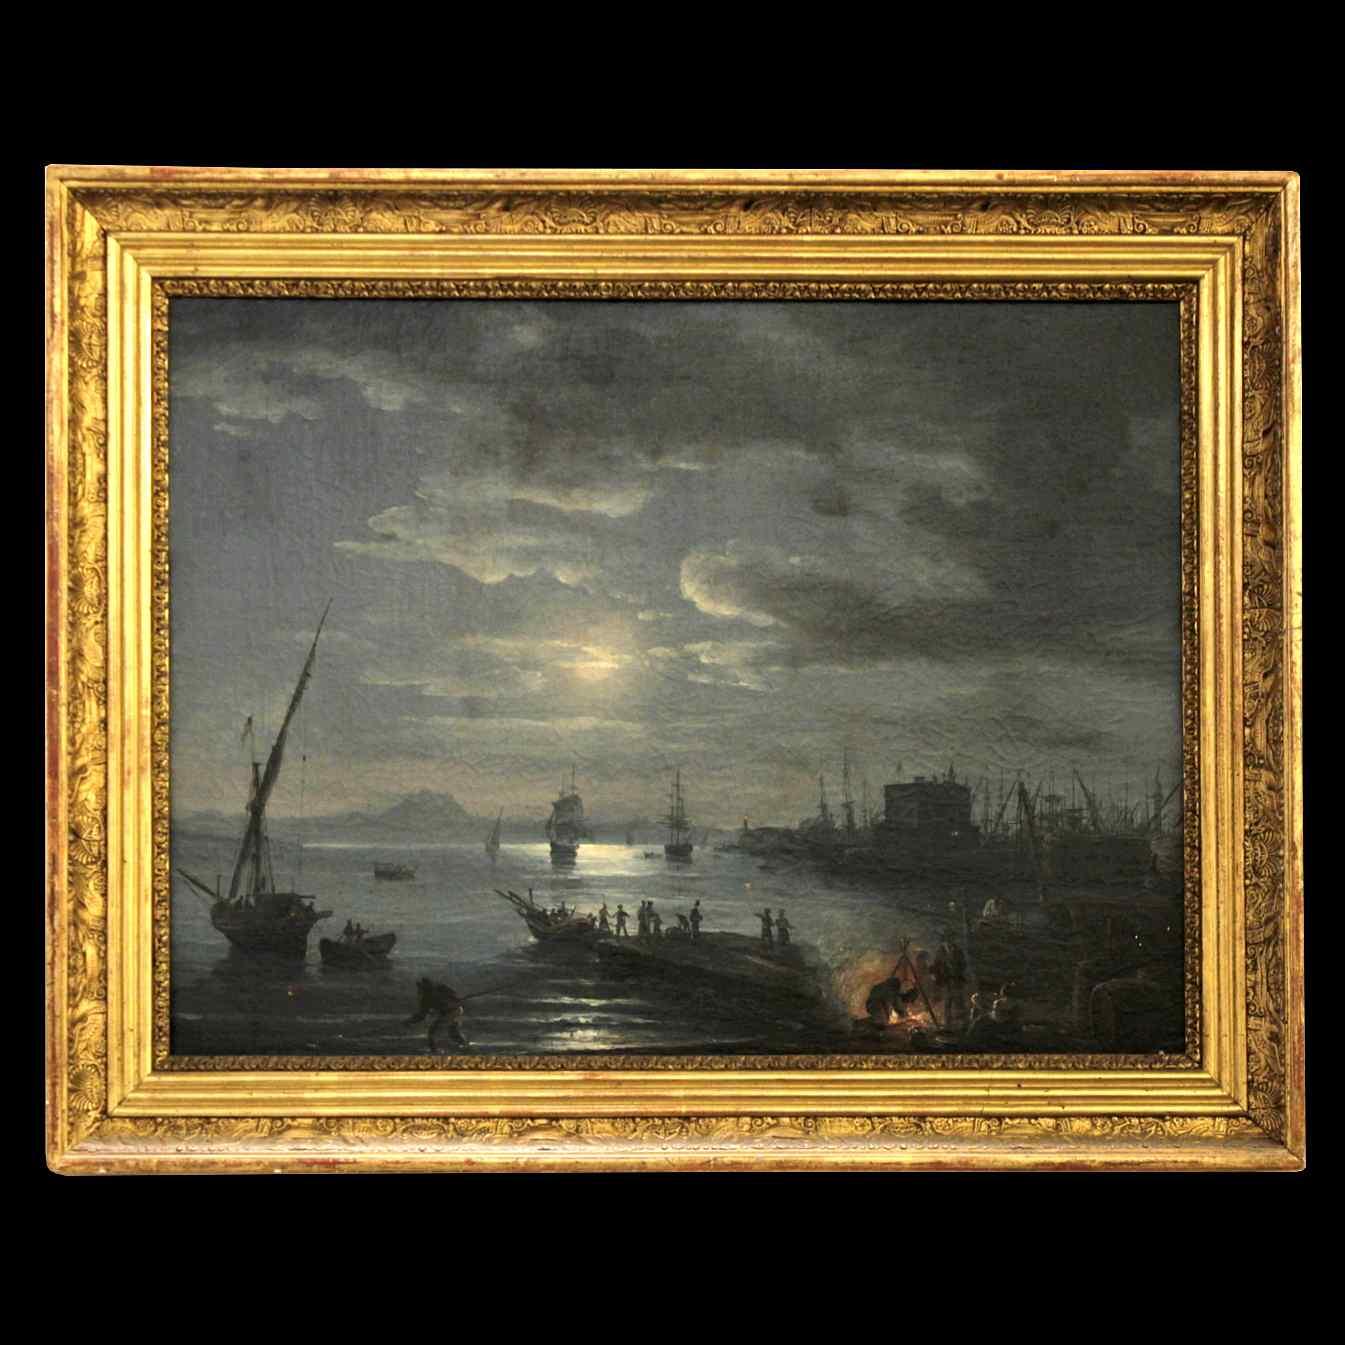 Потрясающая картина Эмиля Жан-Горация VERNET